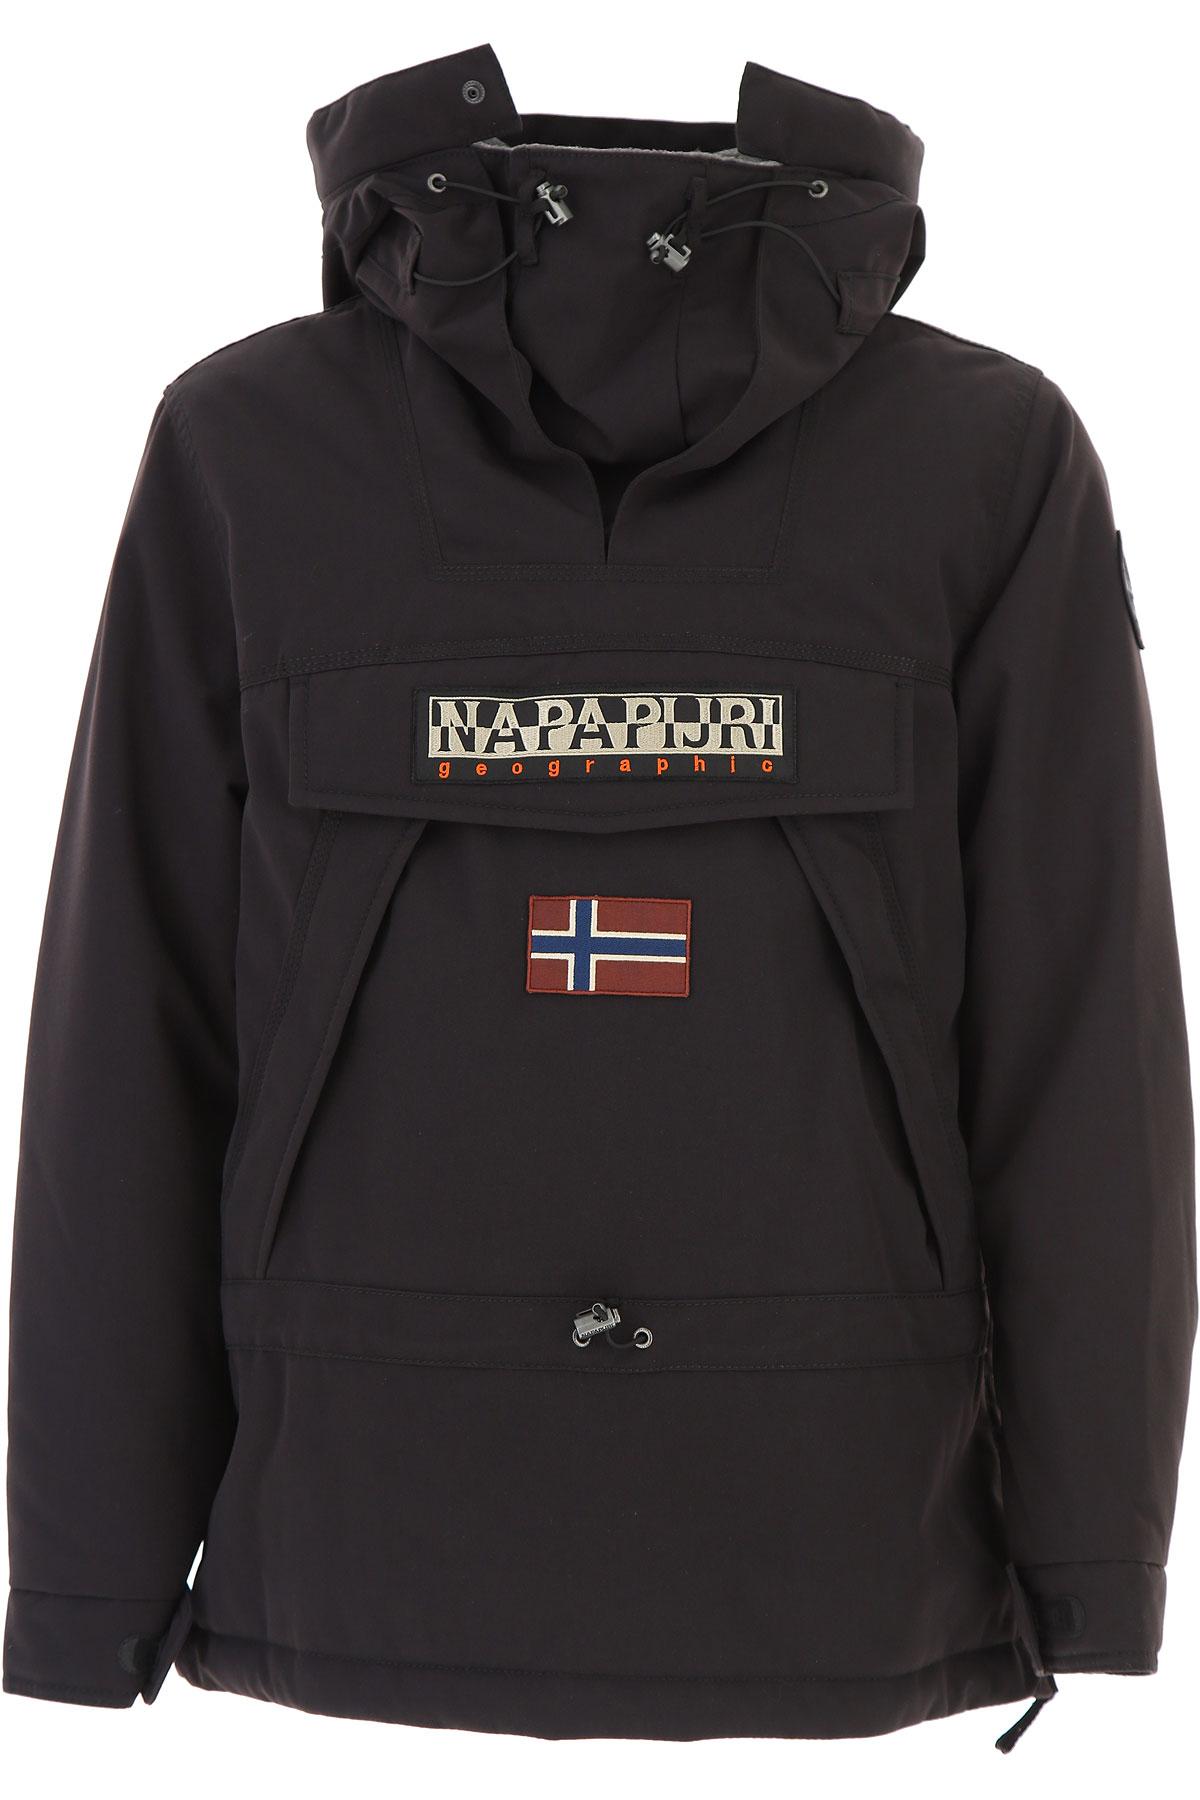 Napapijri Jacket for Men On Sale, Black, polyamide, 2019, L M XL